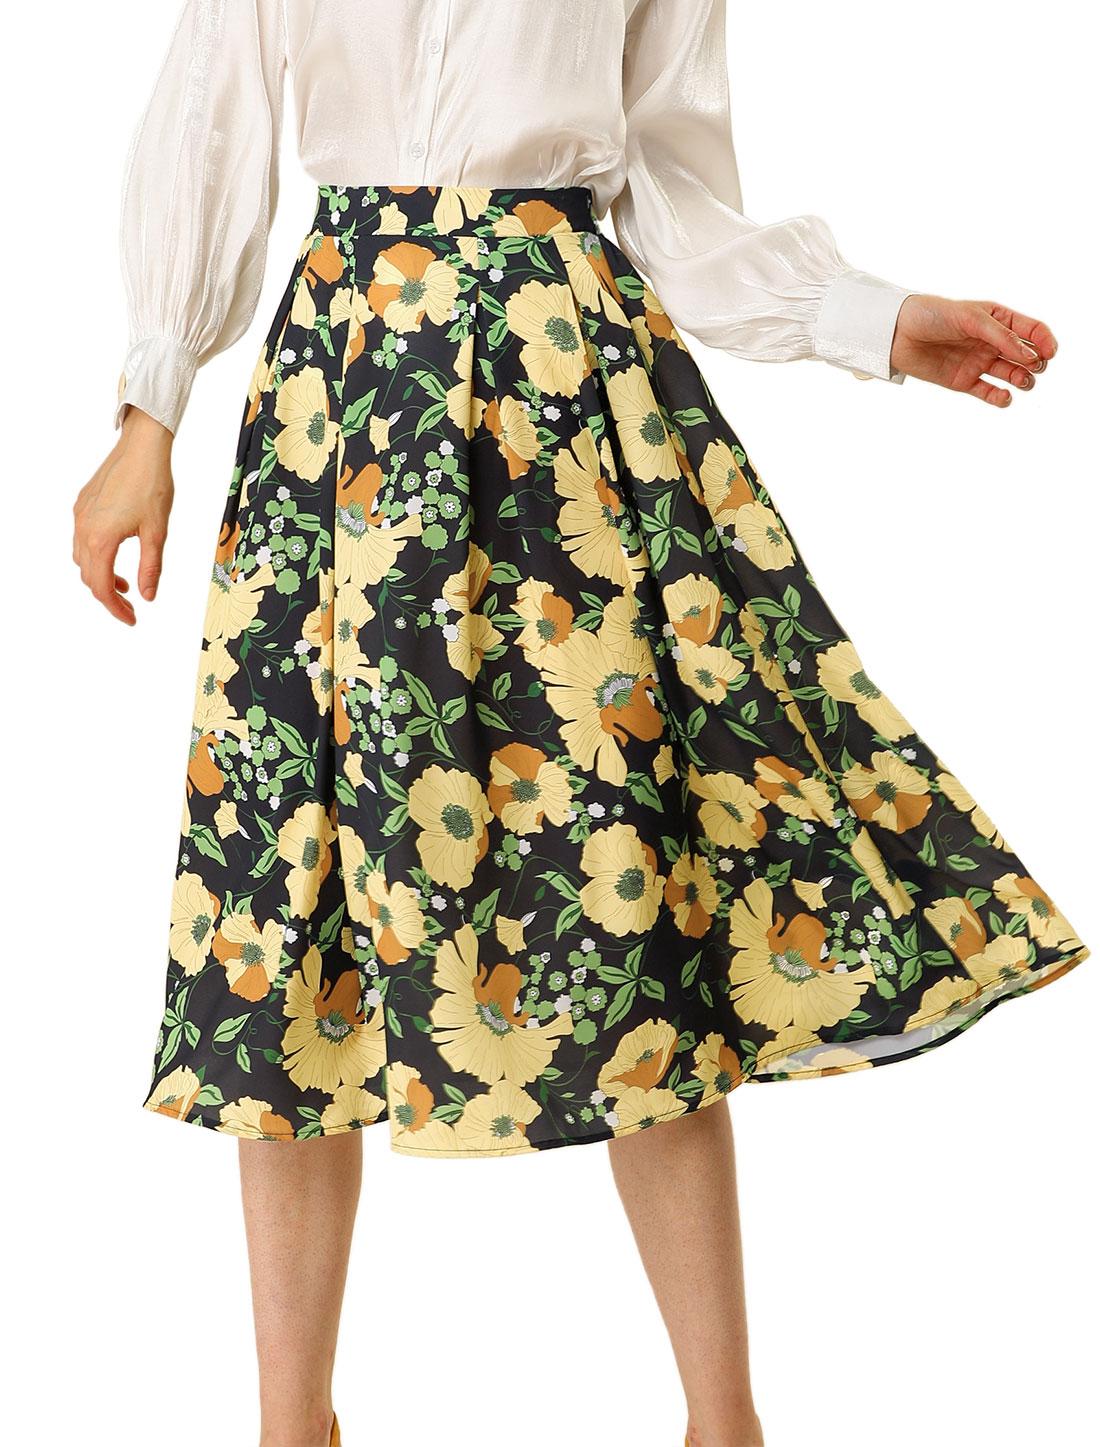 Allegra K Women's Swing Elastic Waist Pleated Midi Floral Skirt Black Yellow XL